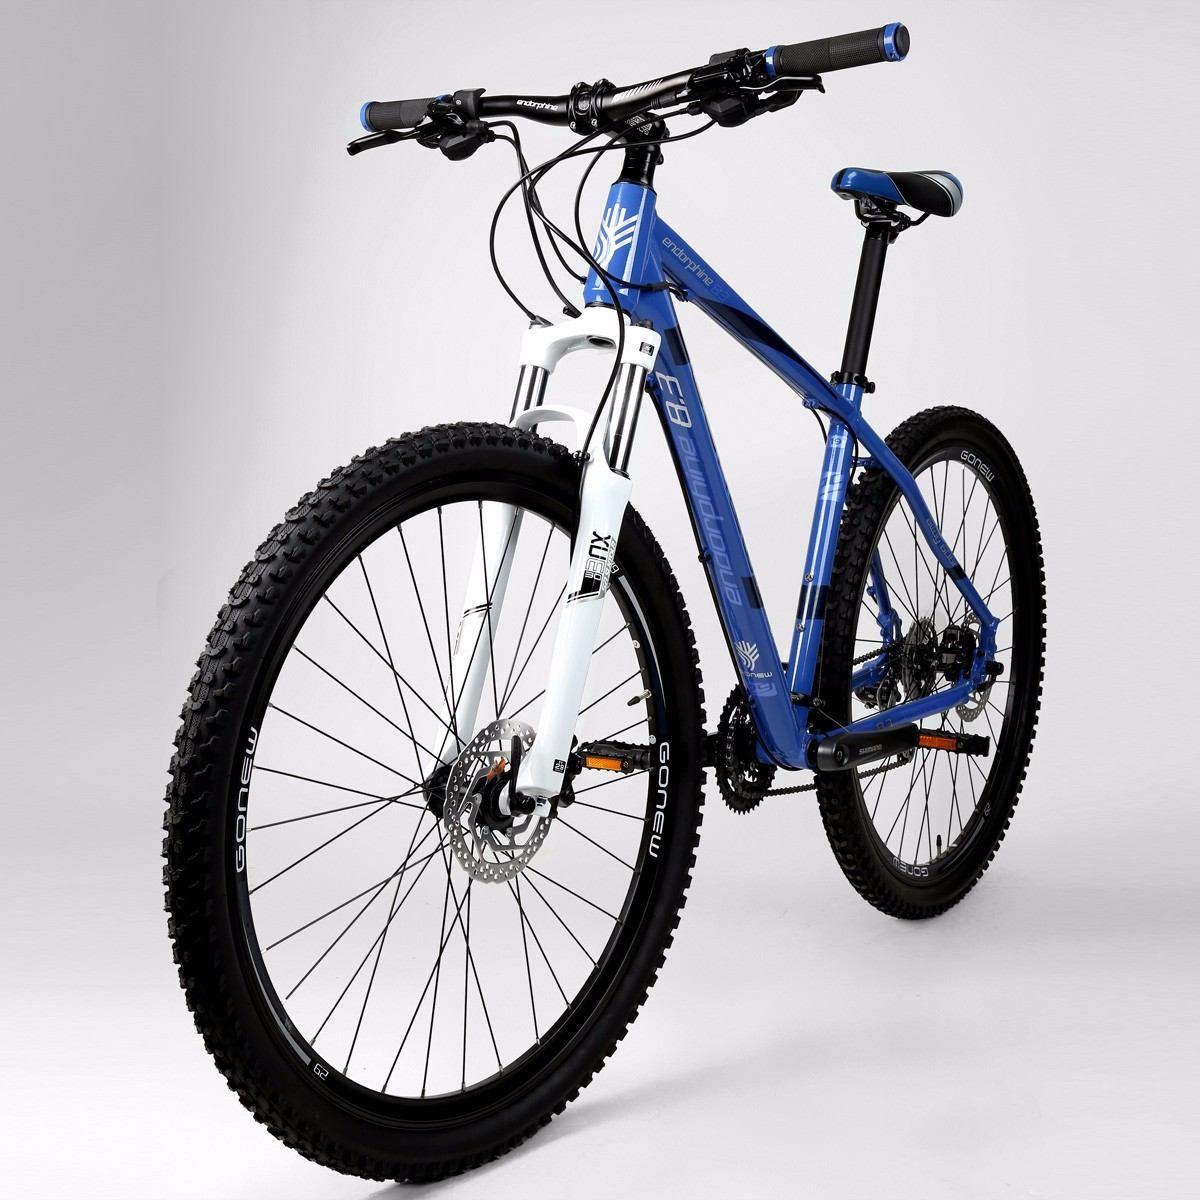 5d1739bbe bicicleta gonew endorphine 8.3 - shimano aro 29 - 27 marchas. Carregando  zoom.